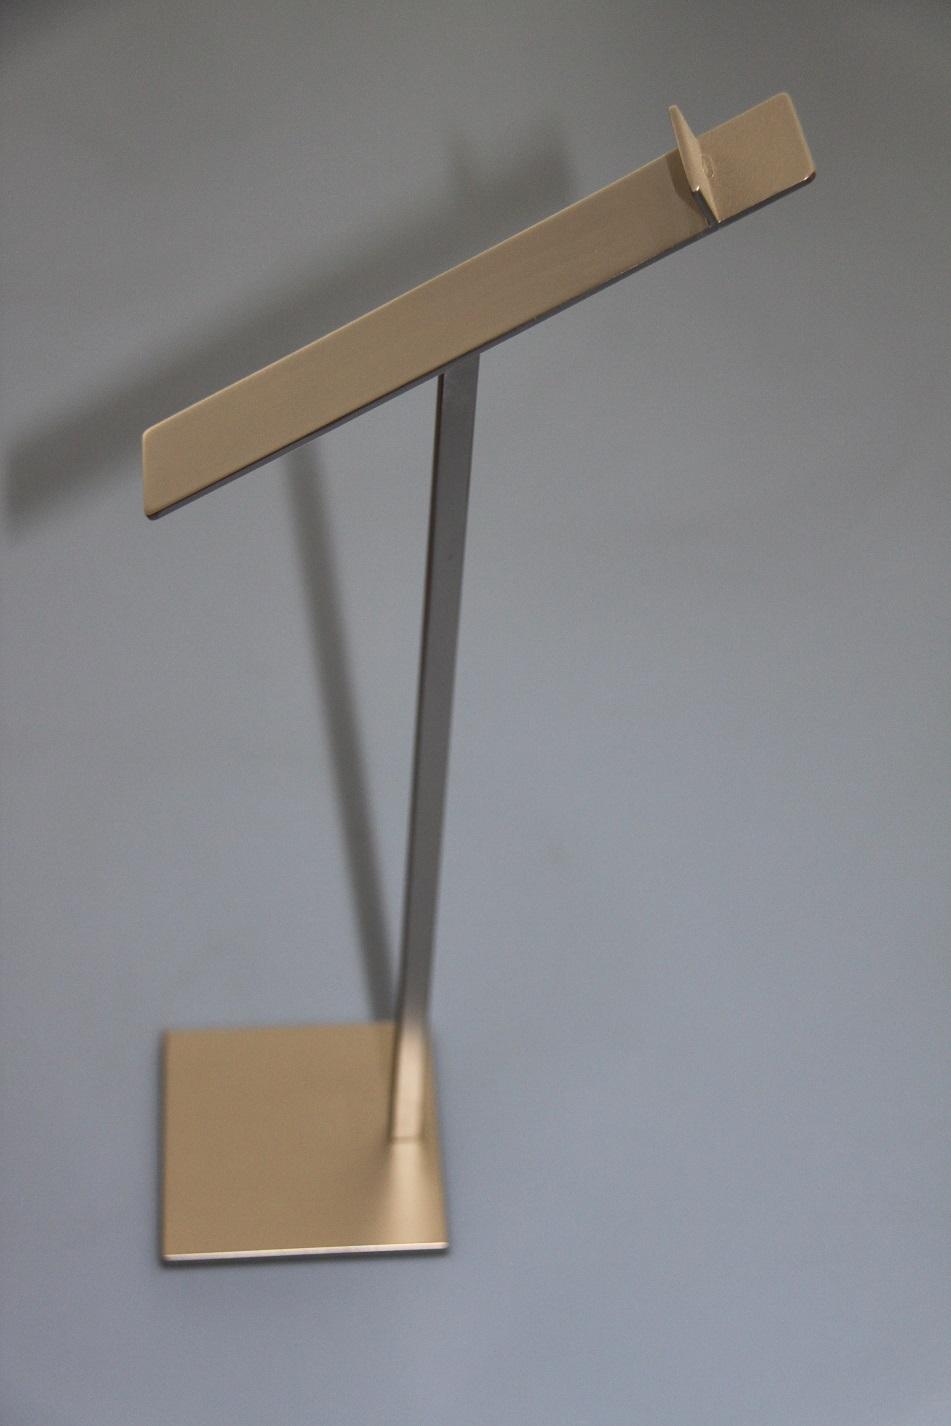 Porta scarpe nikel opaco – Brass nikel matt shoes stand